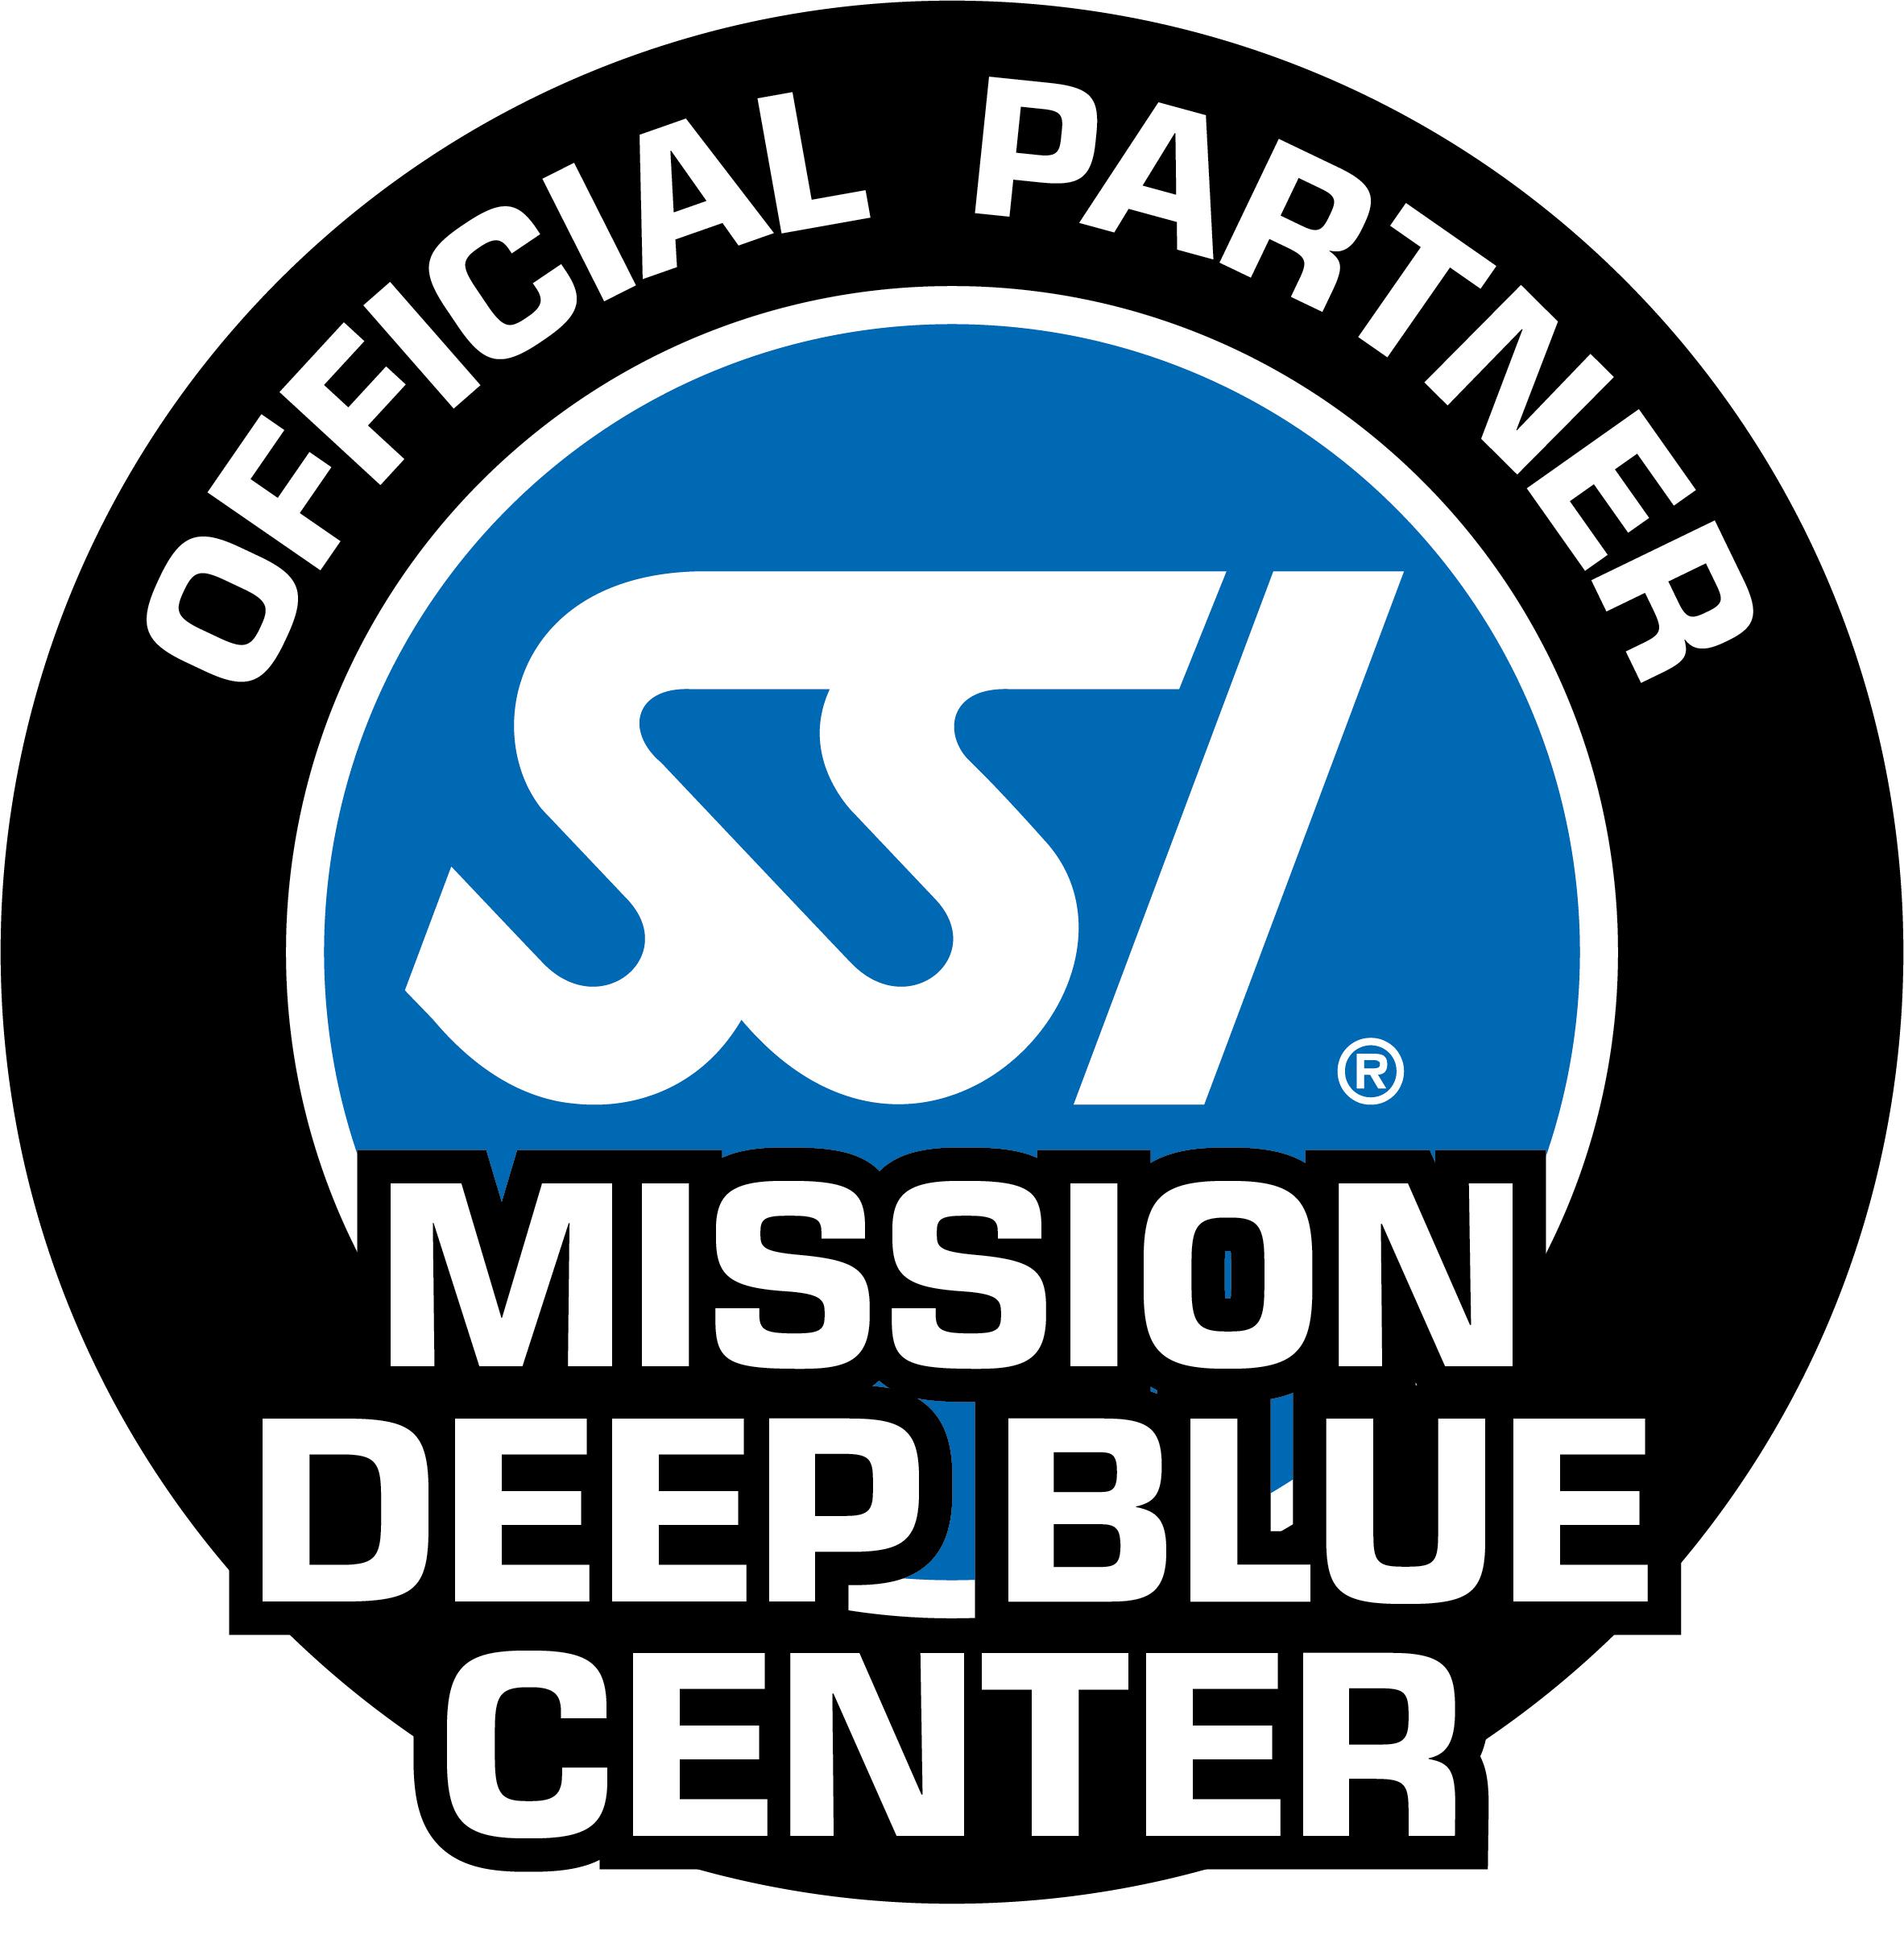 MISSION DEEP BLUE CENTER